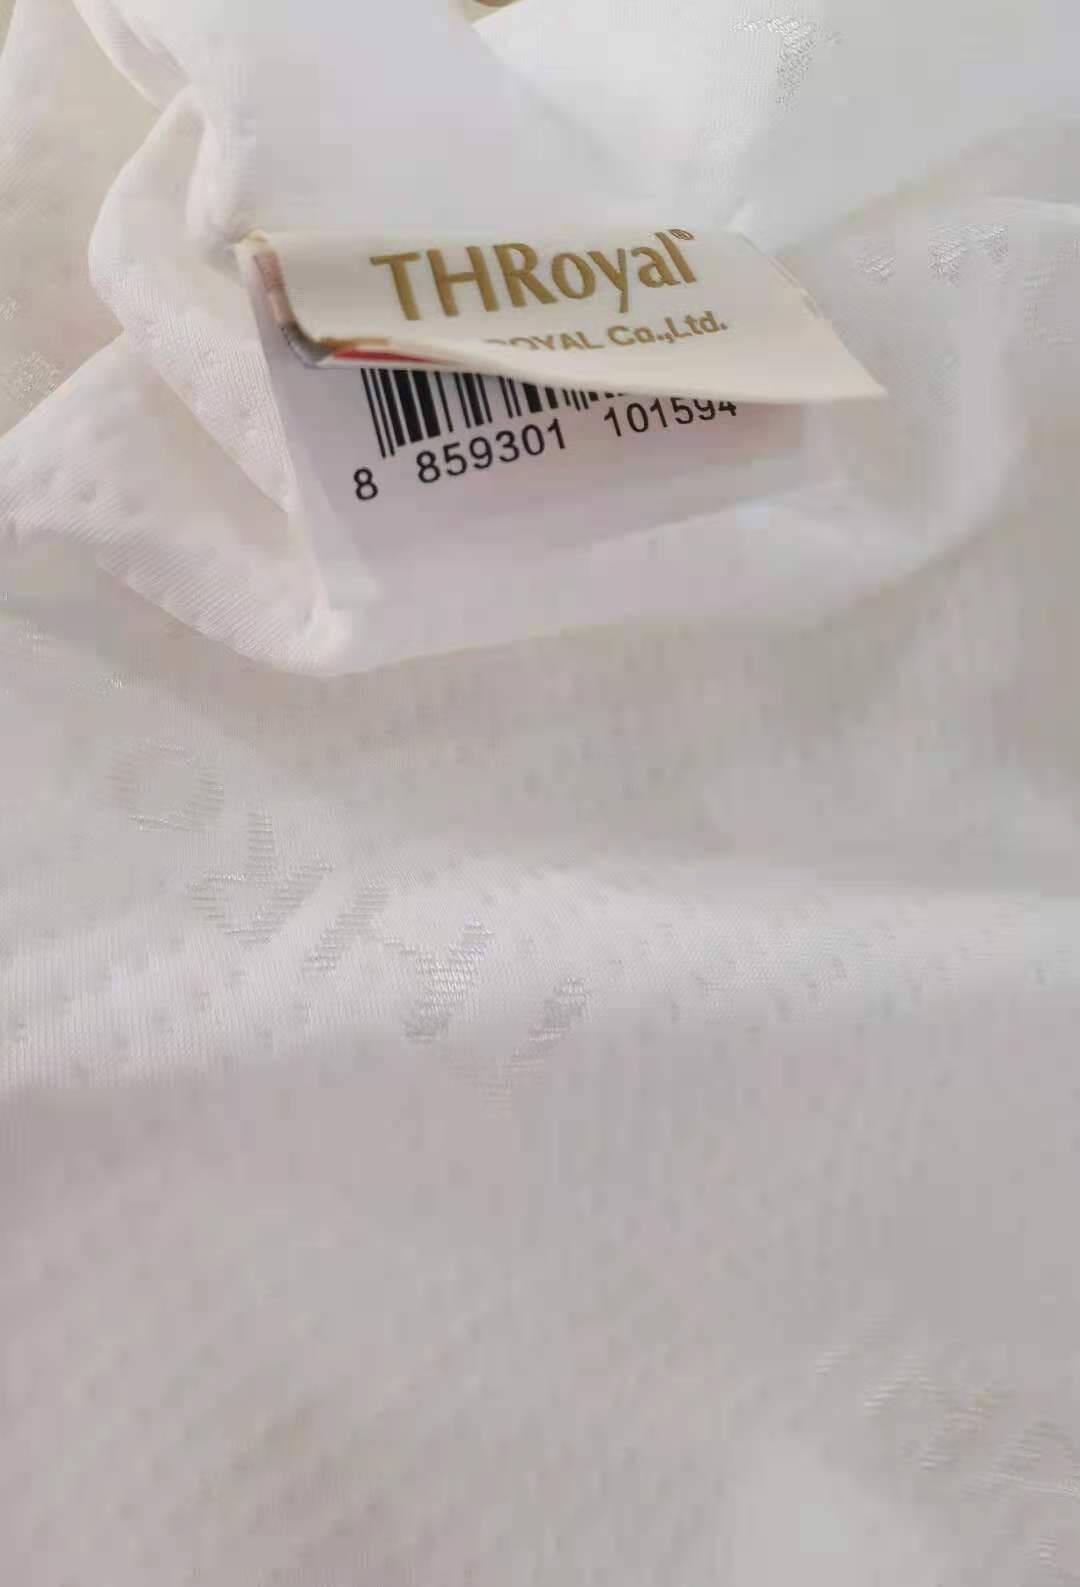 THRoyal泰国原装进口乳胶床垫七区按摩颗粒款1.2/1.5/1.8米单人双人天然橡胶床垫七区按摩厚7.5cm(乳胶含量93%)95D密度180*200cm